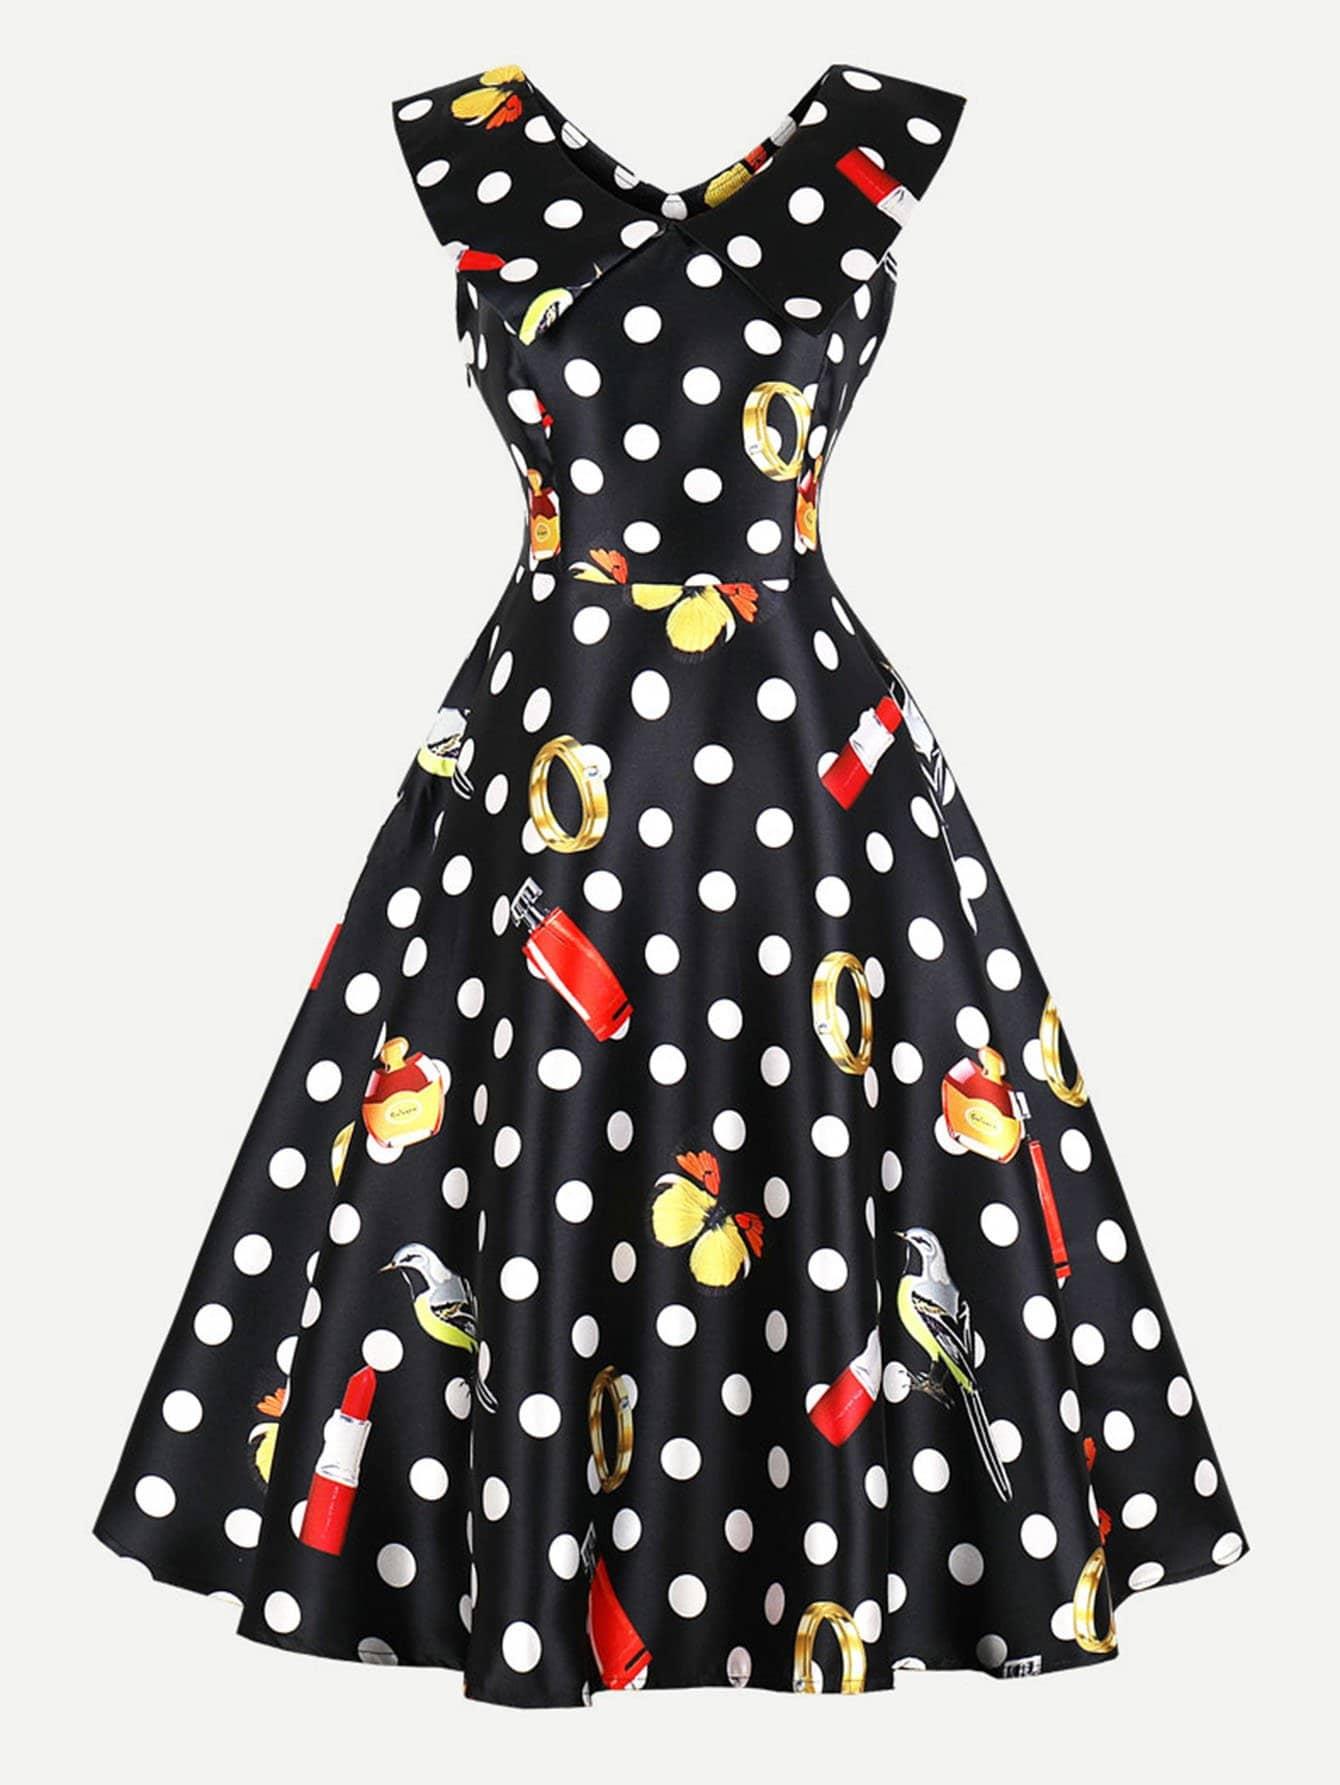 Polka Dot Zip Up Side Dress zip up side plaid dress